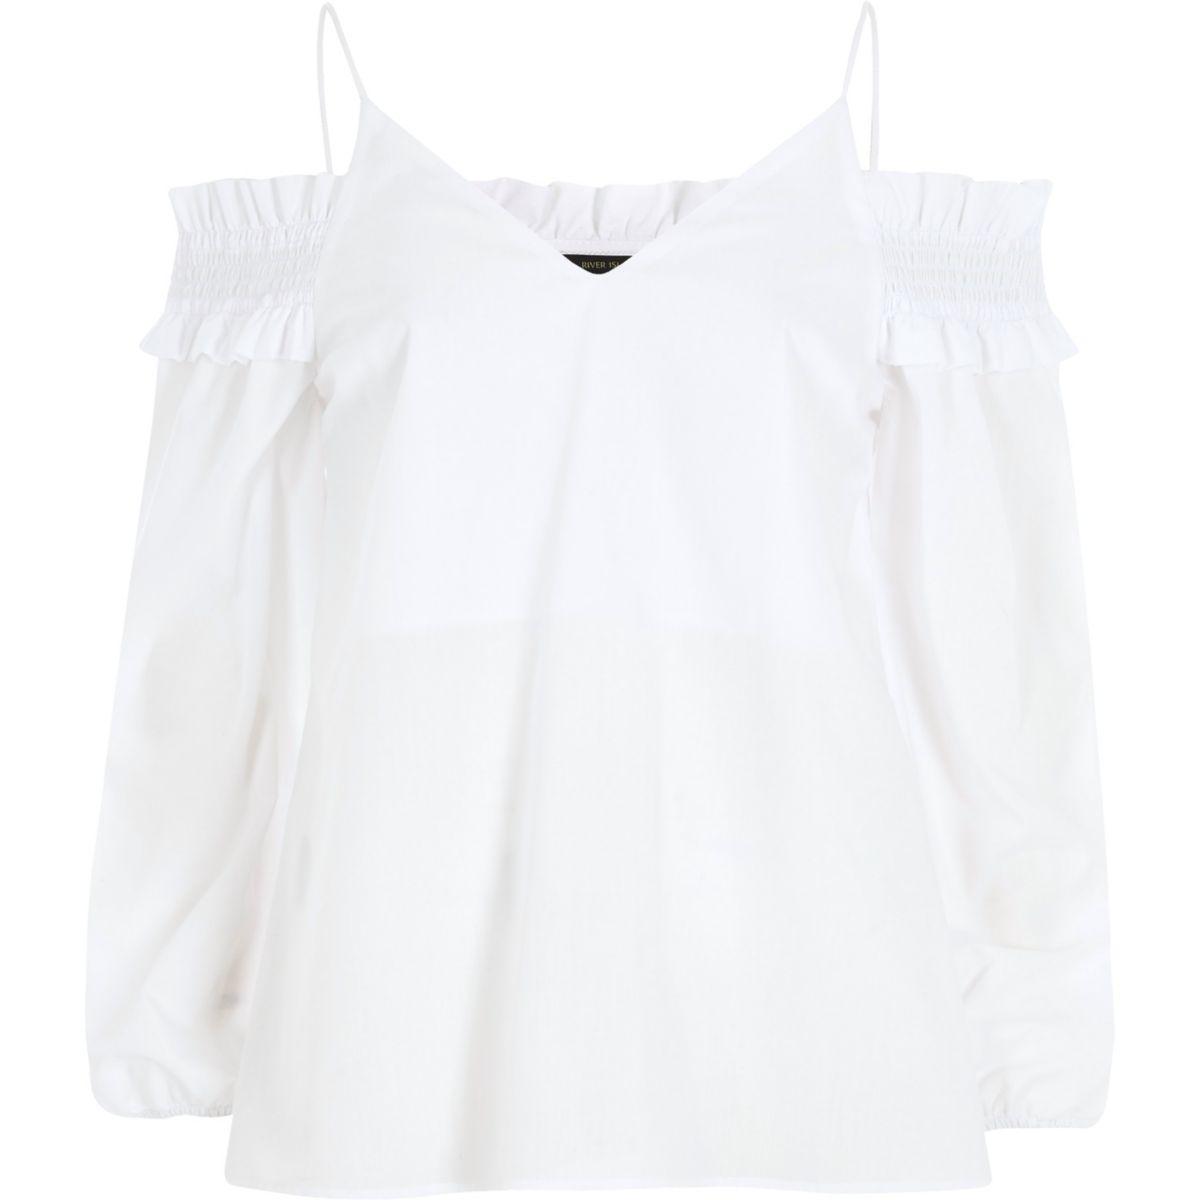 White long sleeve bardot cami strap top